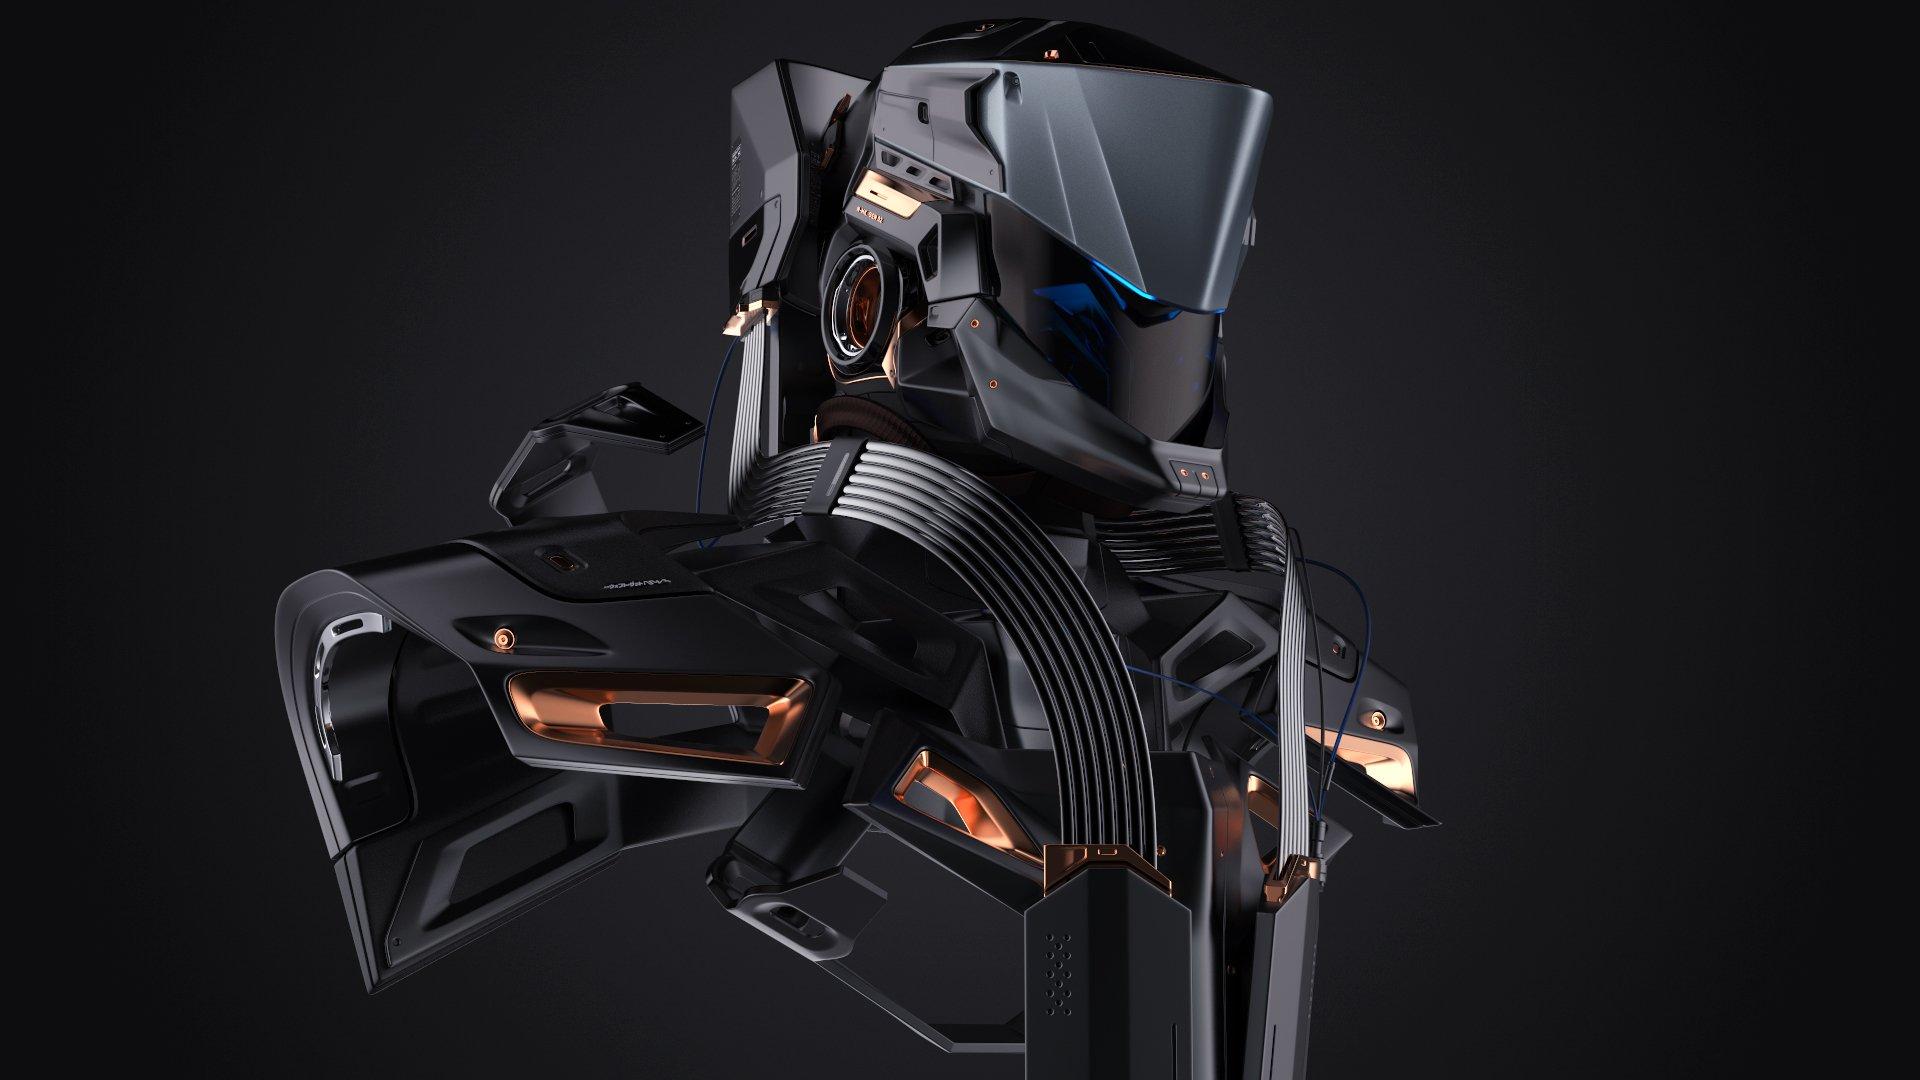 3D Modeling in Maya - Robotic Design - Elementza 3D Art